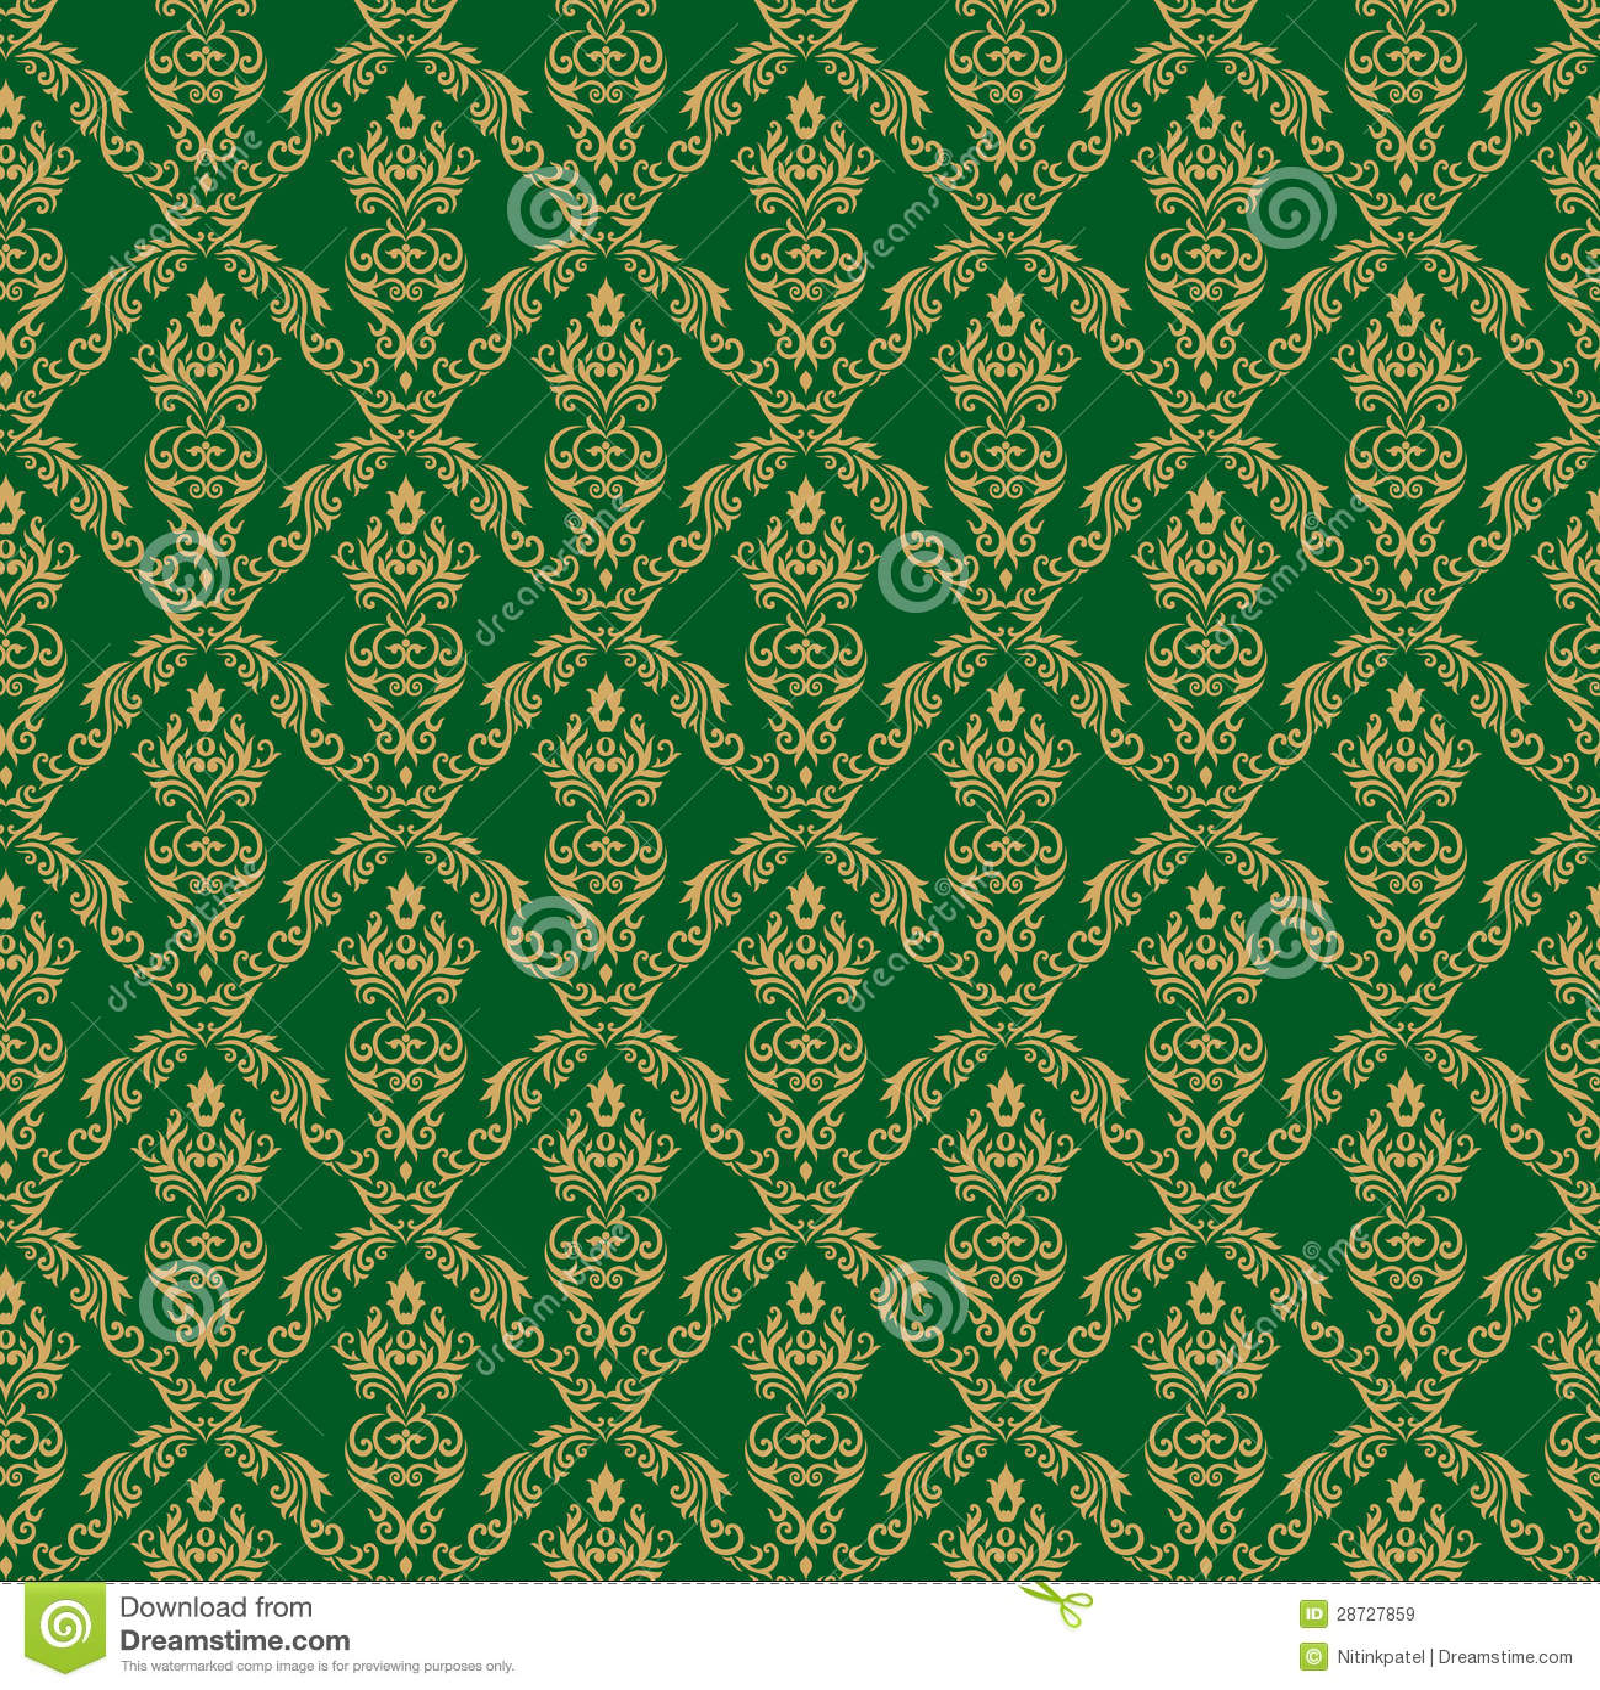 Seamless Damask Wallpaper 1 Green Color